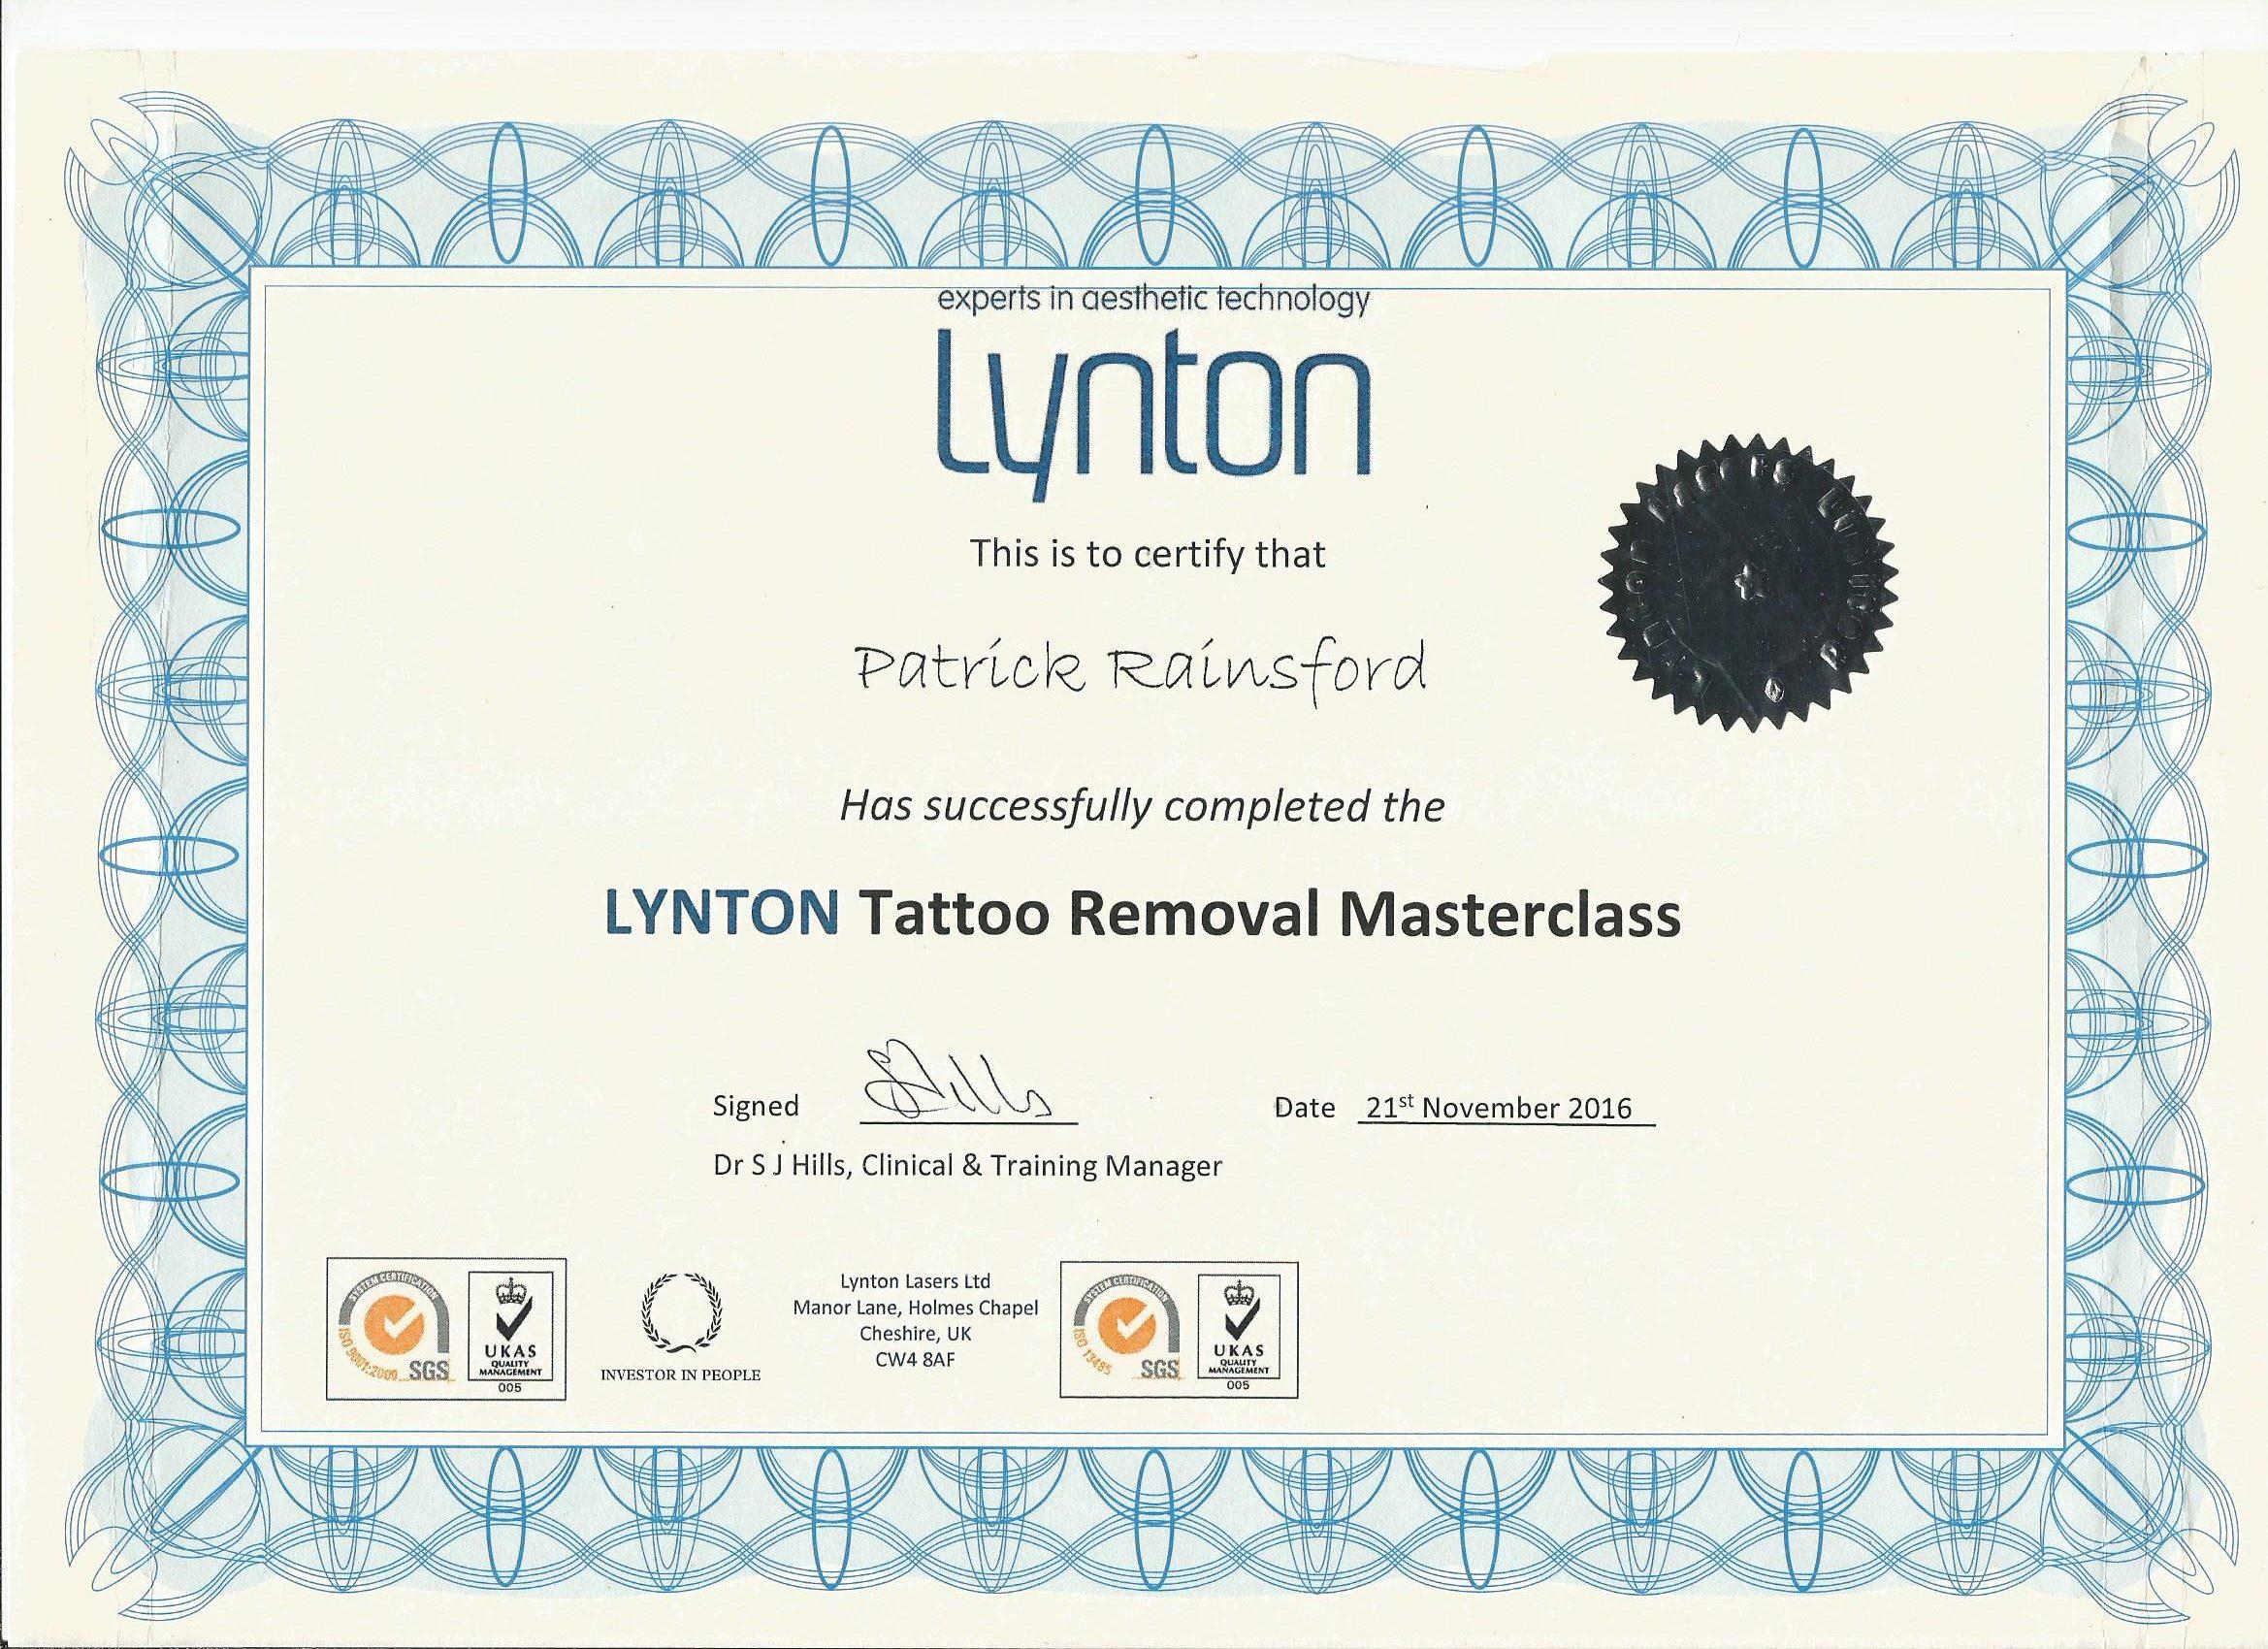 Lynton Tattoo Removal Masterclass